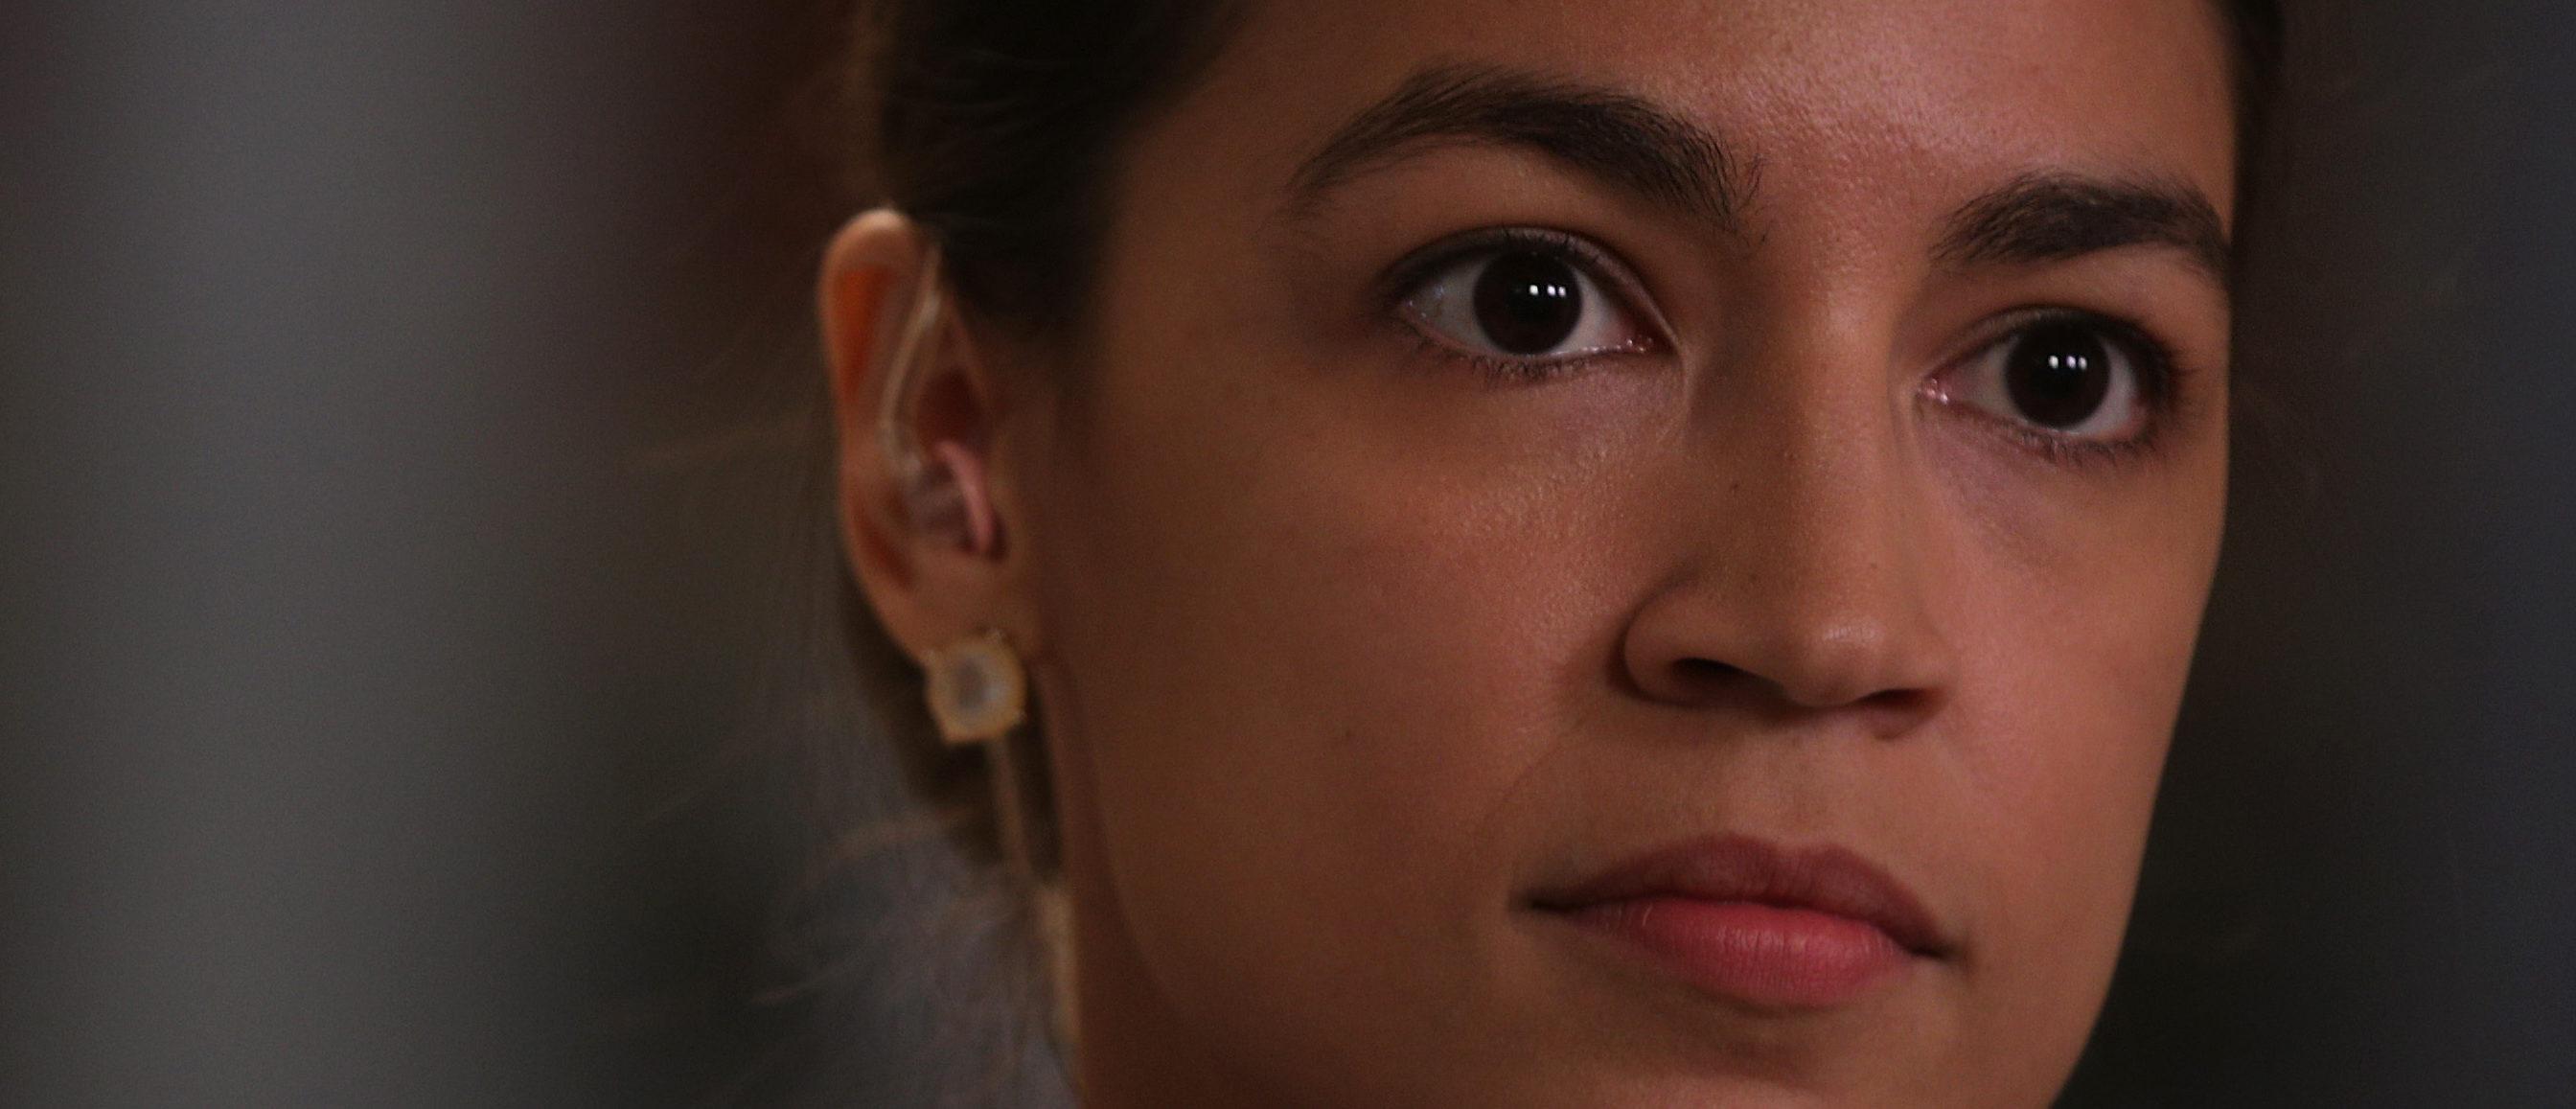 U.S. Rep. Alexandria Ocasio-Cortez (D-NY) (Alex Wong/Getty Images)